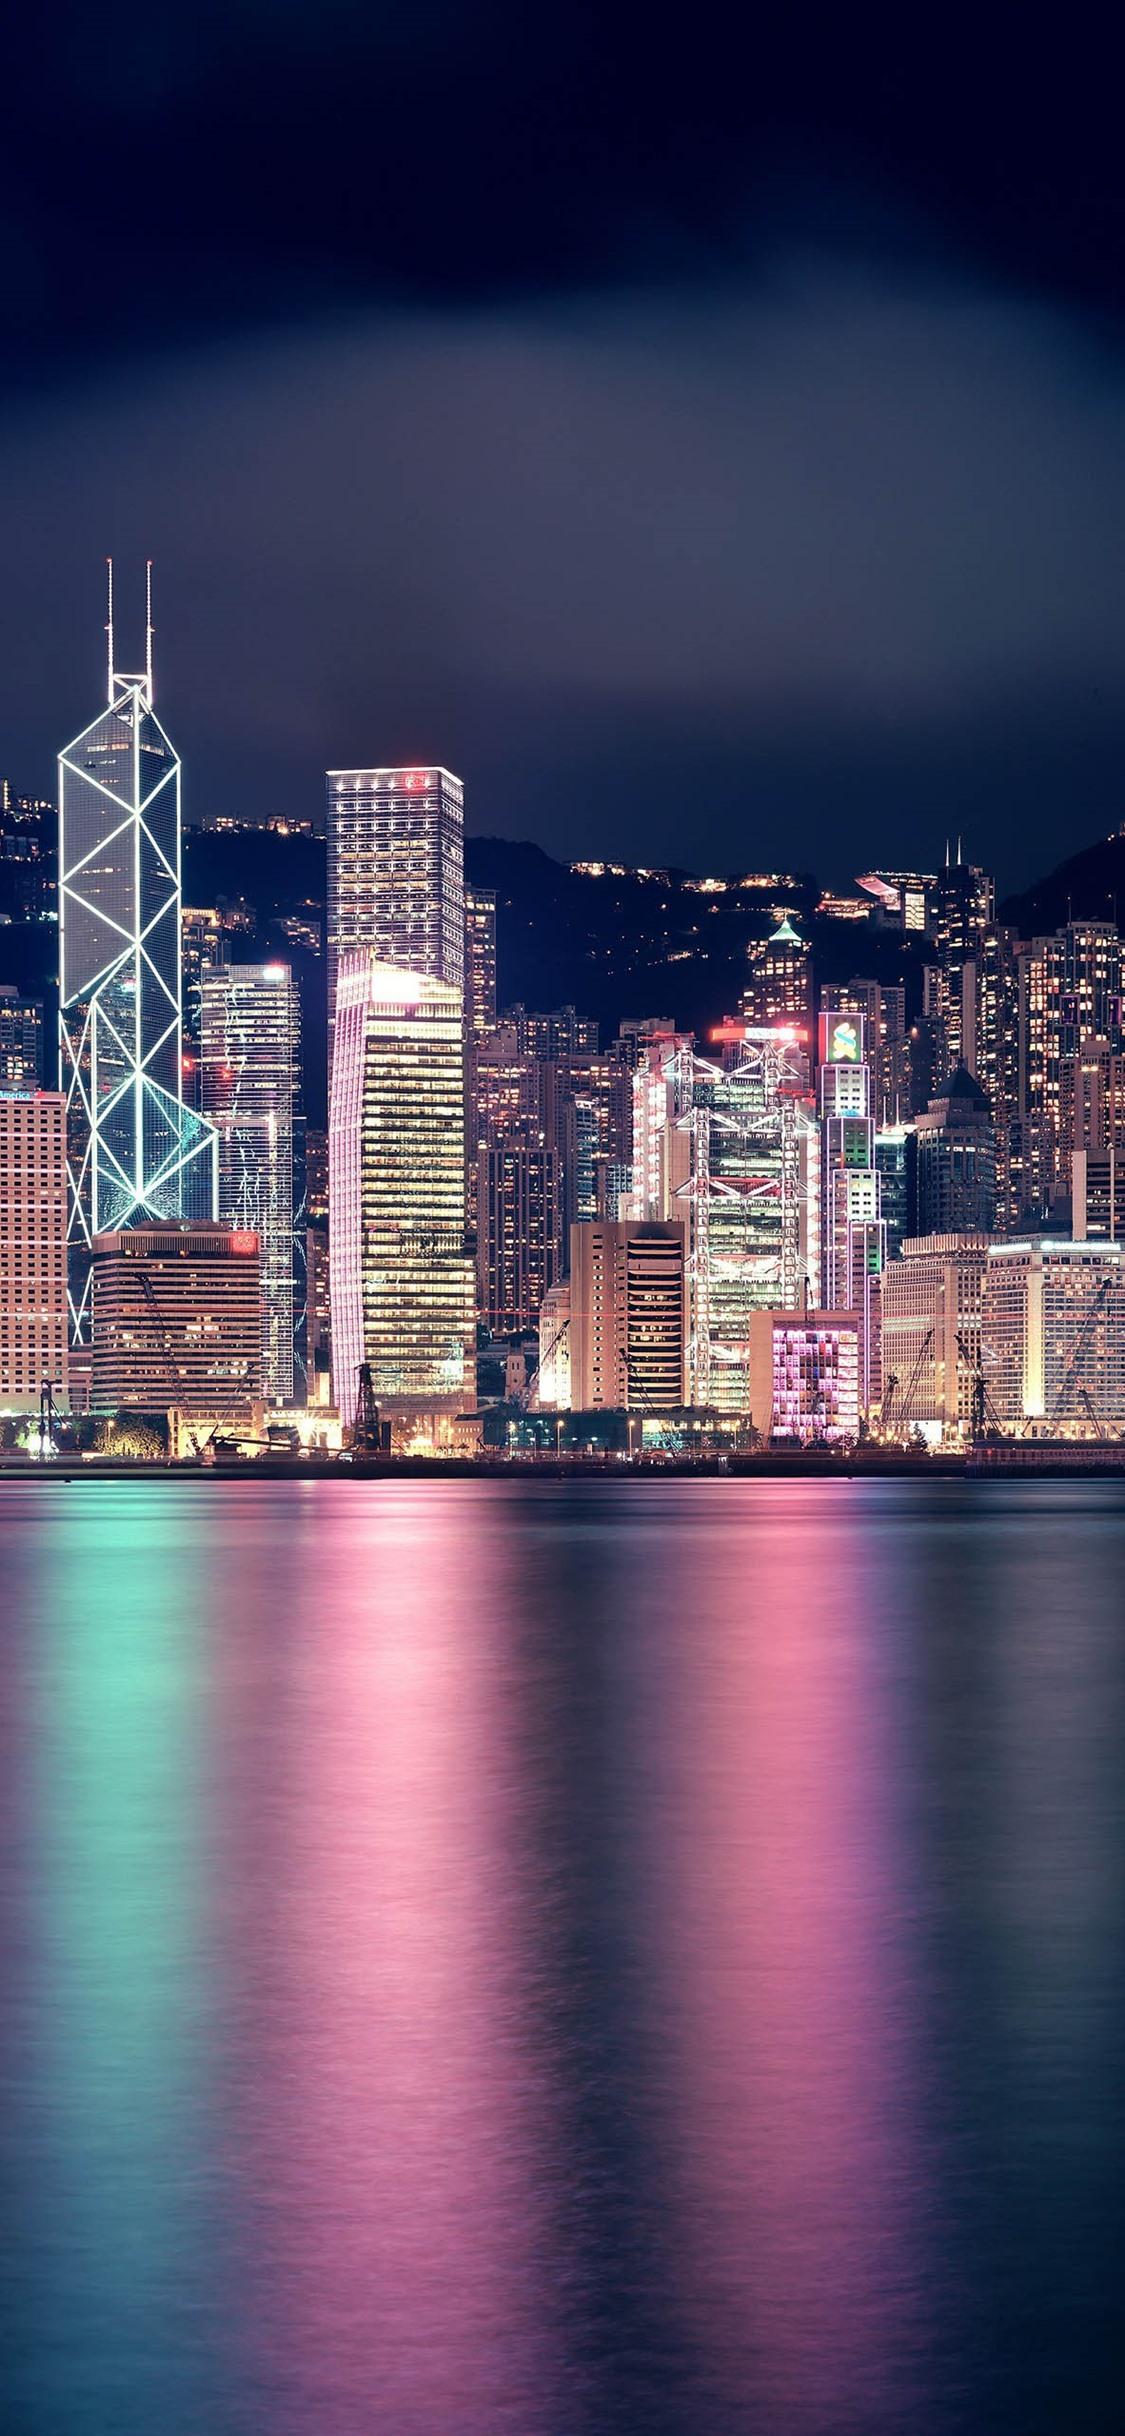 Beautiful City At Night Hong Kong Skyscrapers Lights Sea